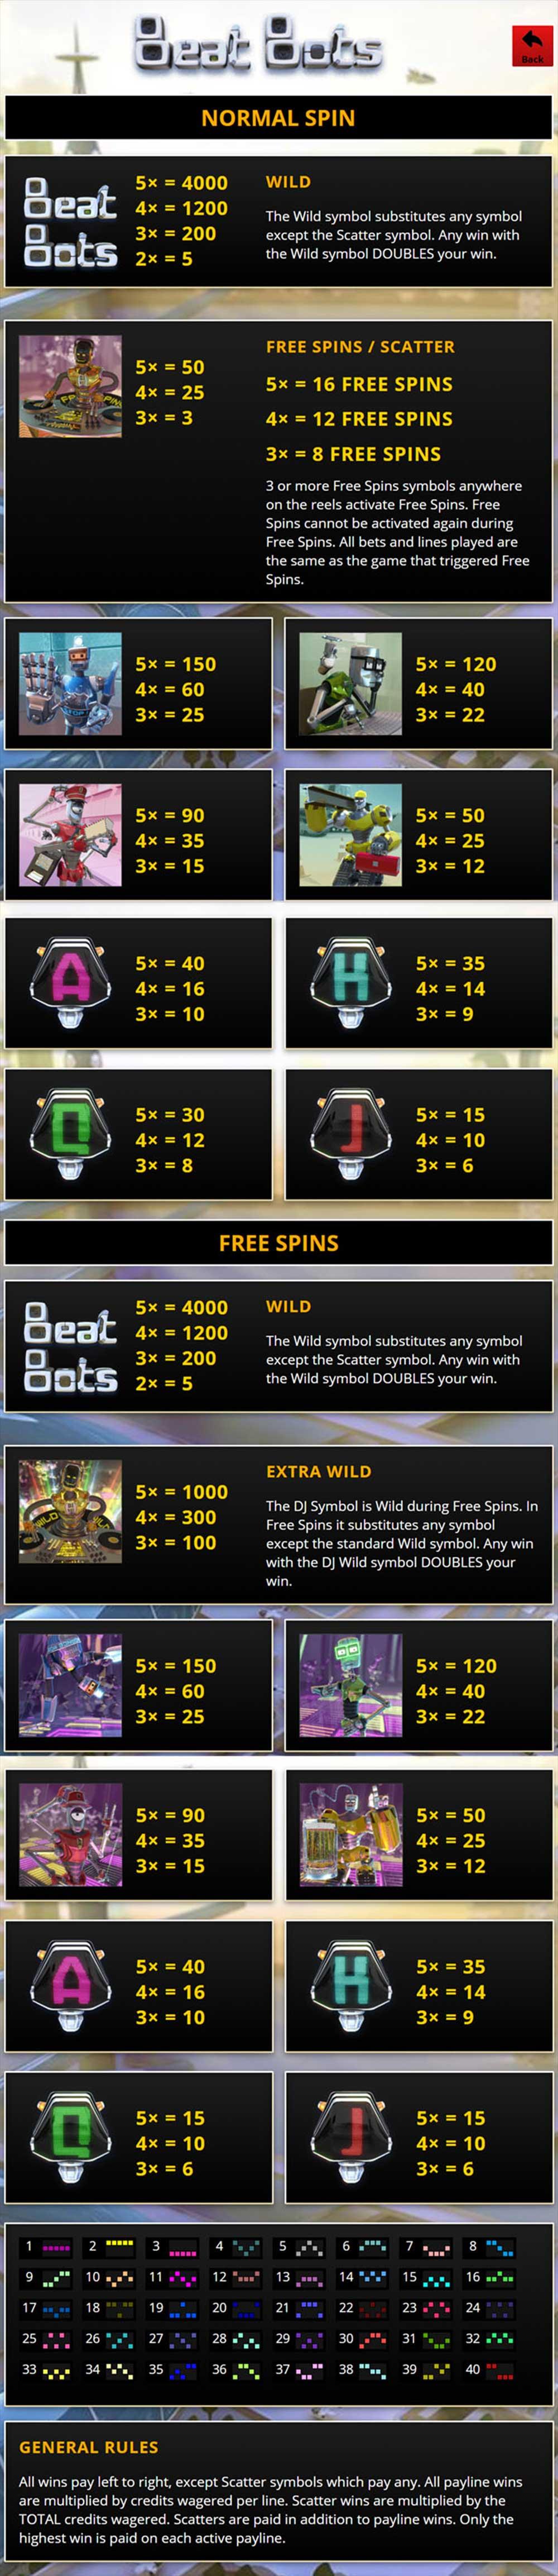 Beat Bots Pay Table Screenshot, Big Dollar Casino